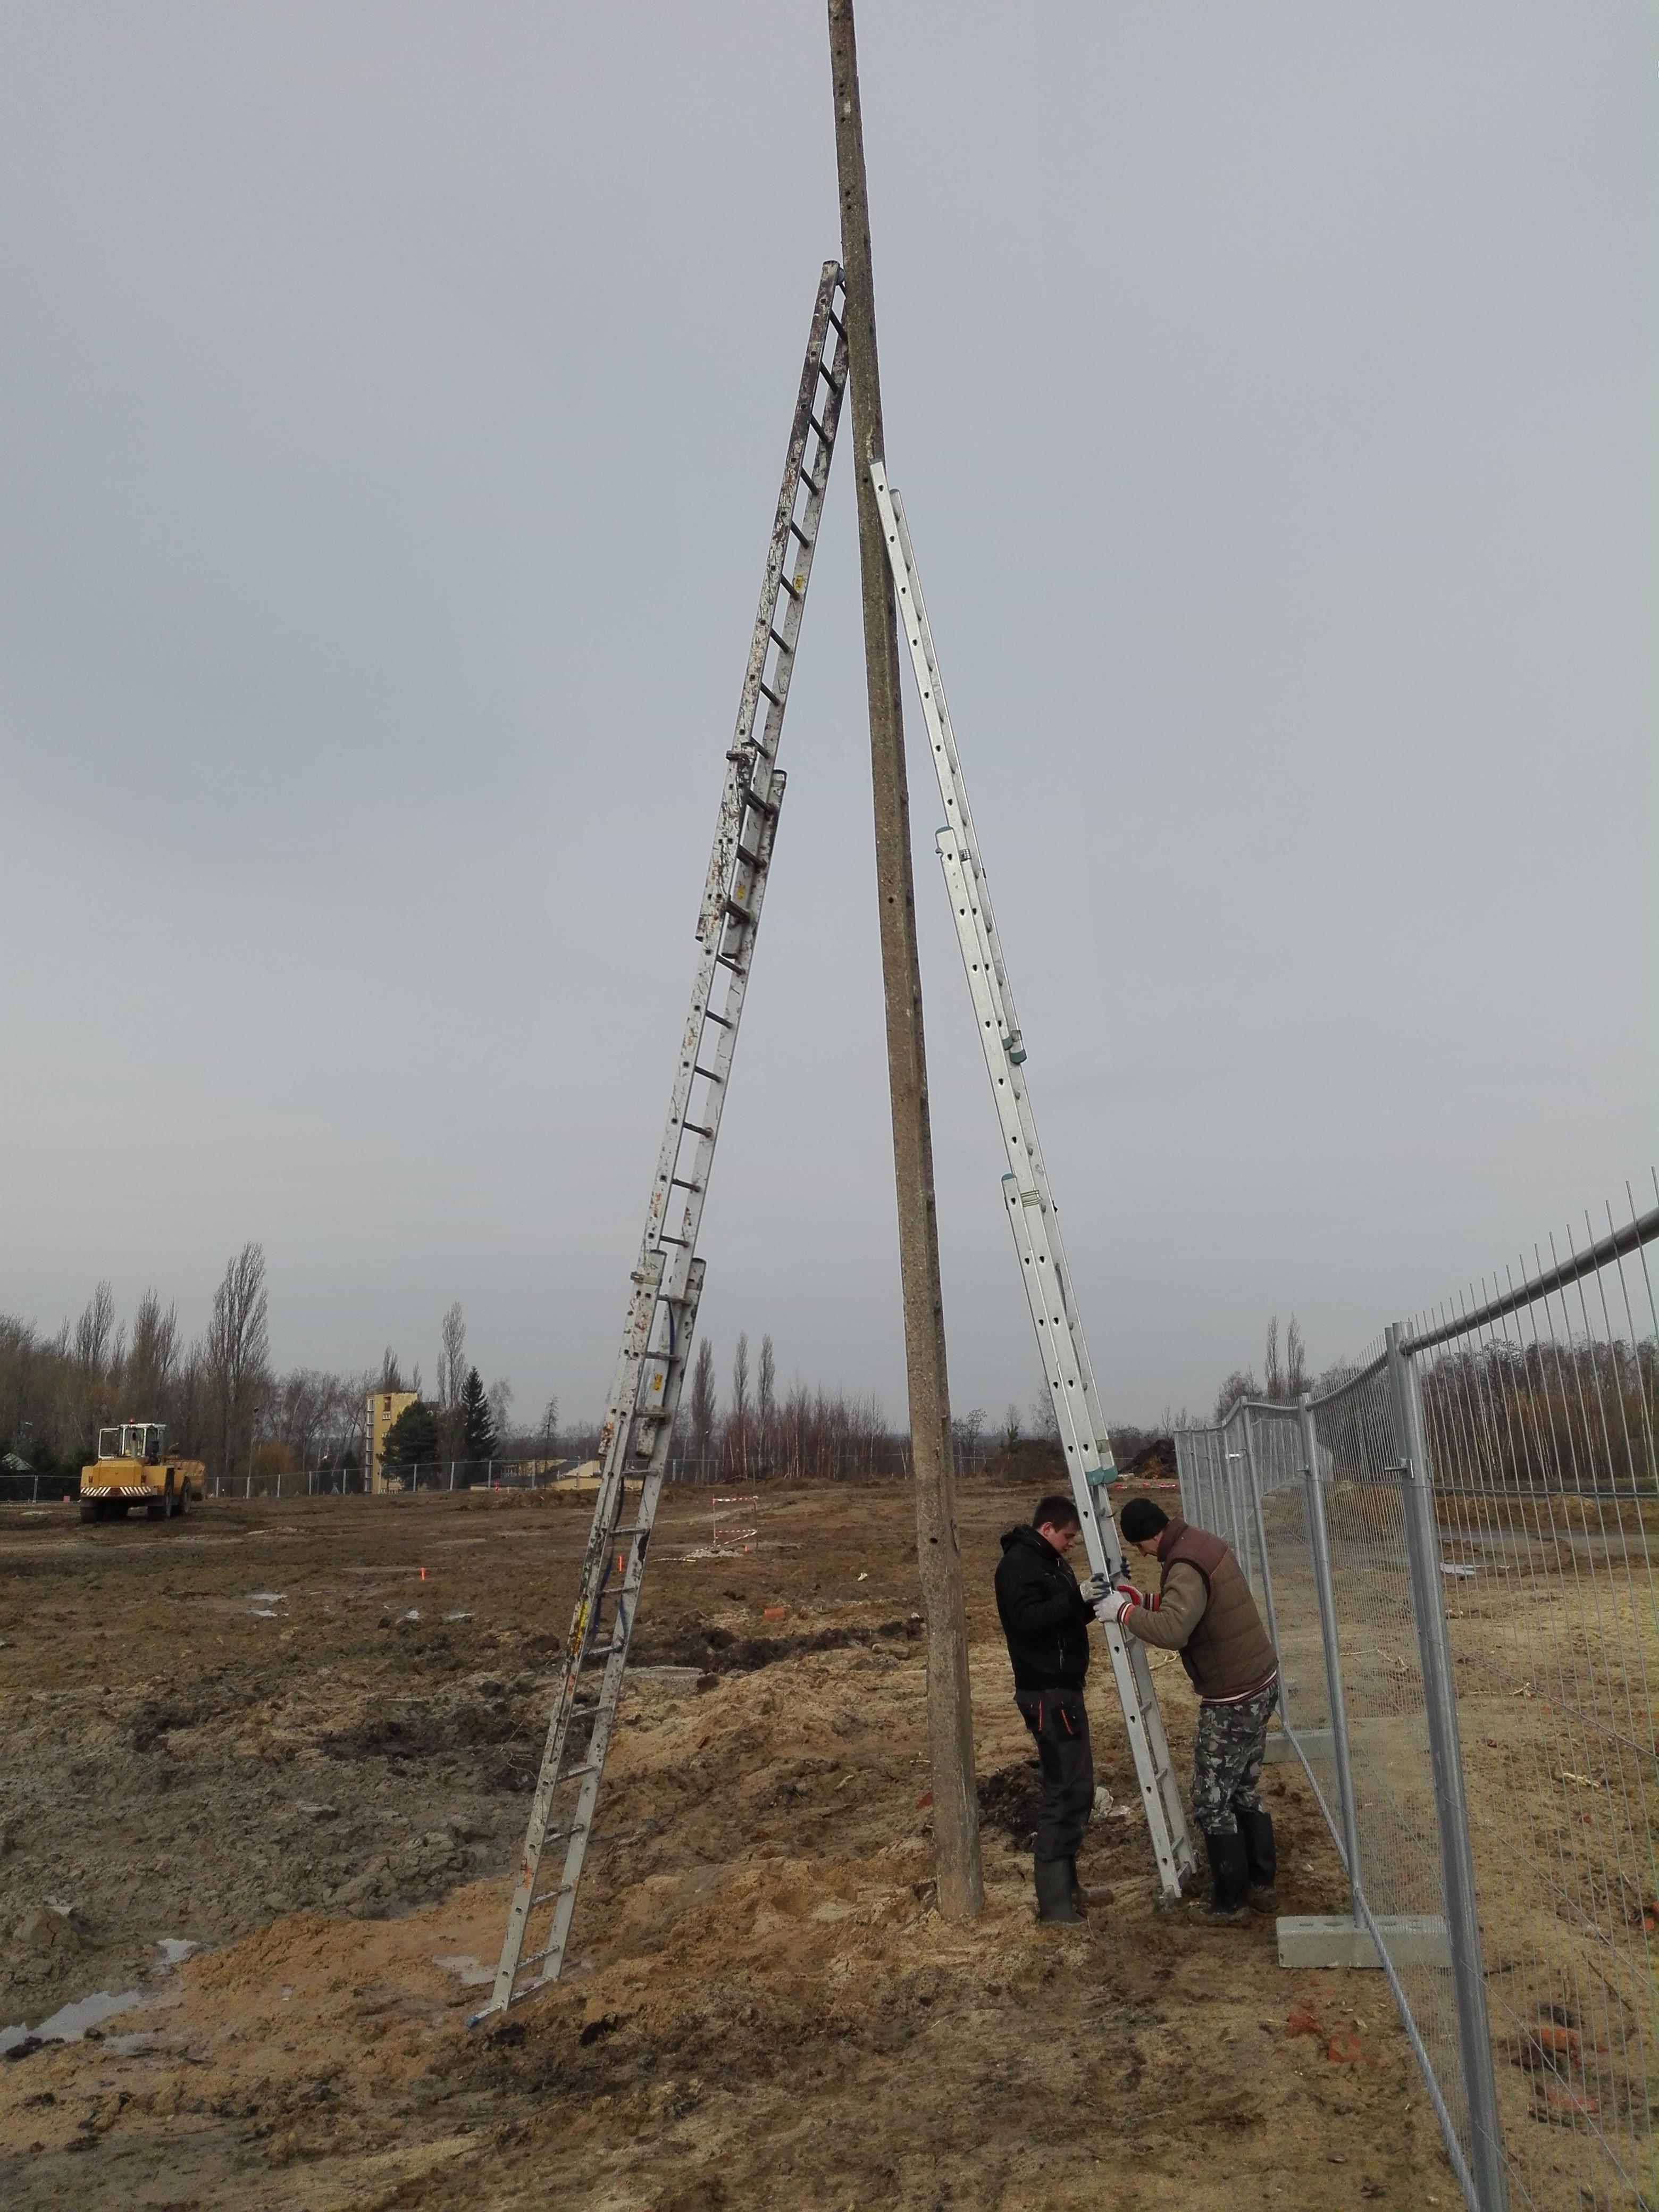 monitoring placu budowy fabryki schollglas w tarnobrzegu -- kamery hikvision